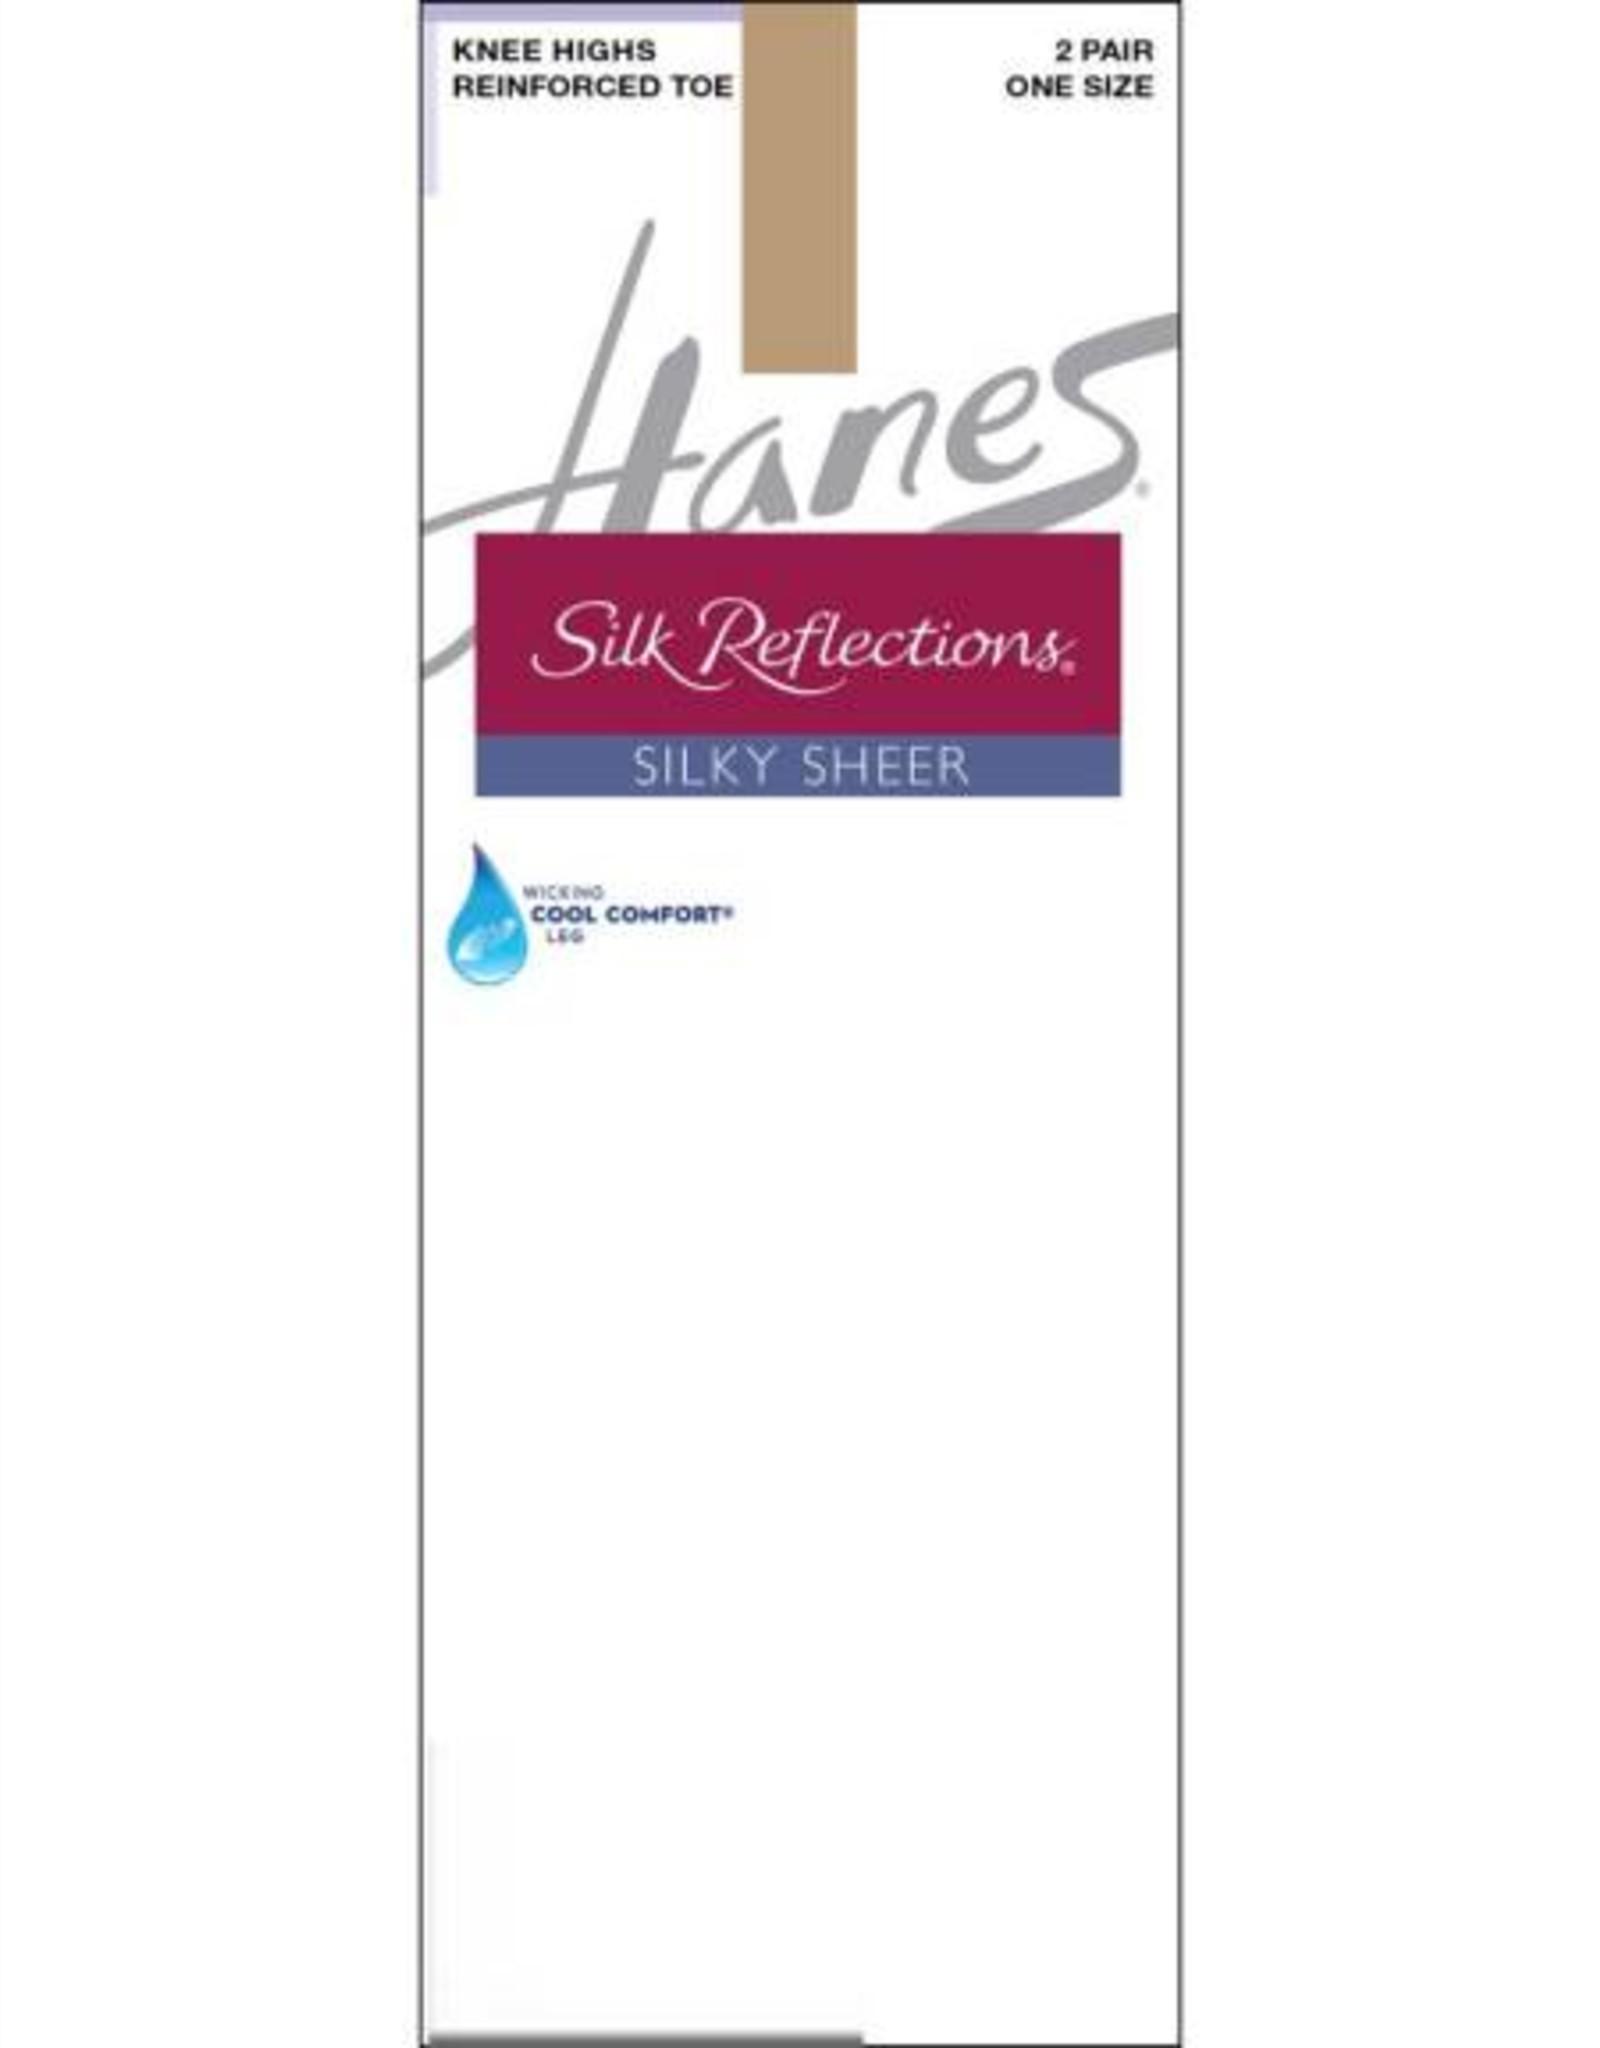 Hanes Hanes Silk Reflections Silky Reinforced Toe Knee Hi 2-Pack